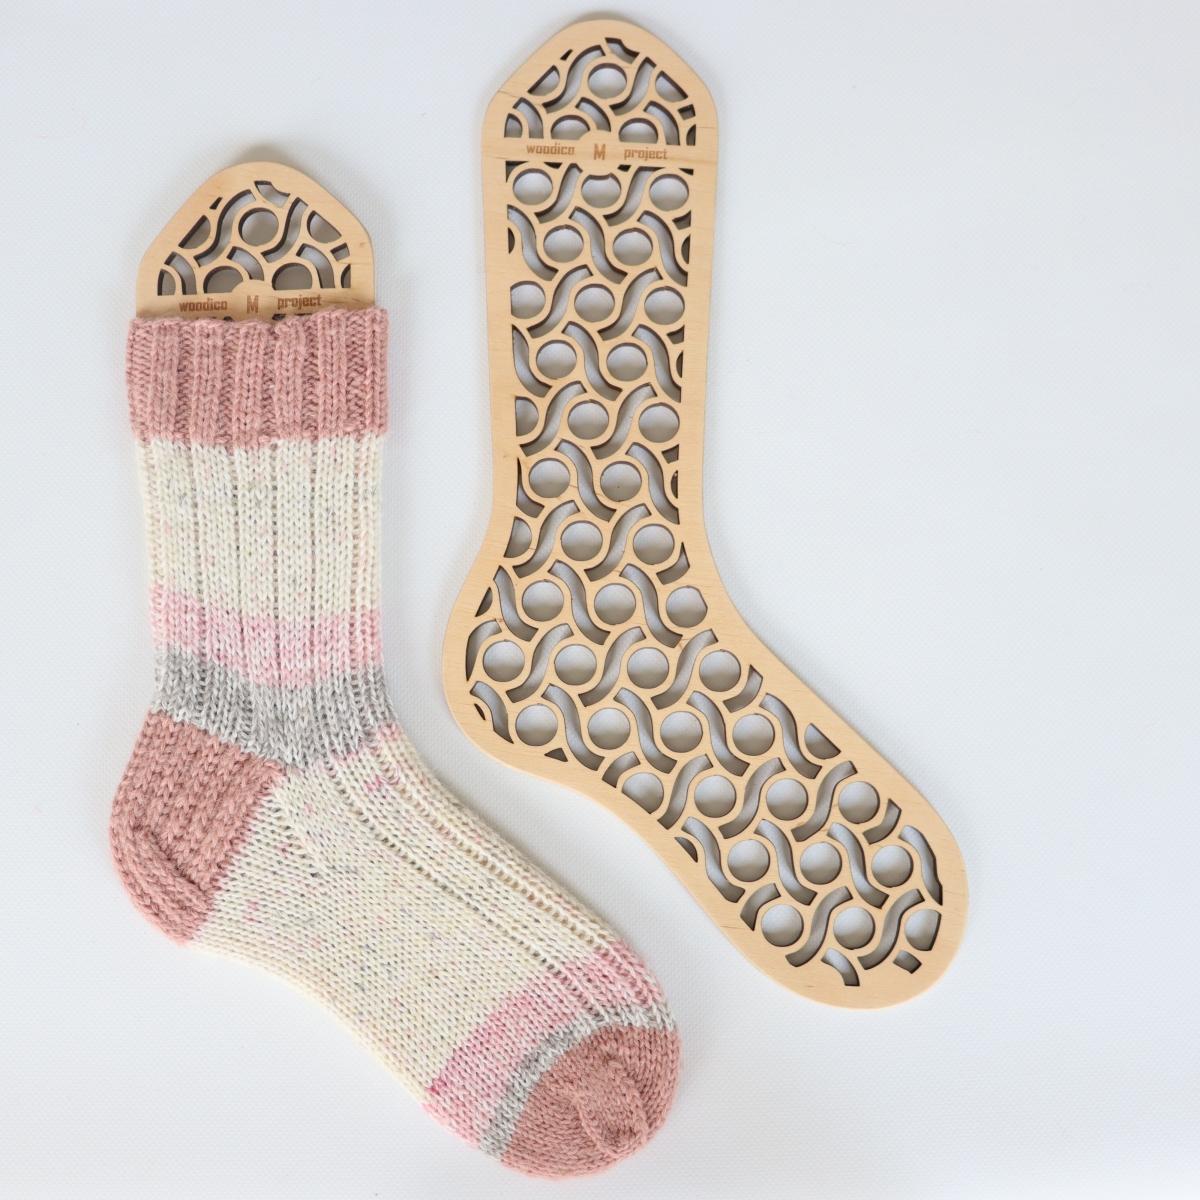 woodico.pro wooden sock blockers pasta 1200x1200 - Wooden sock blockers / Pasta